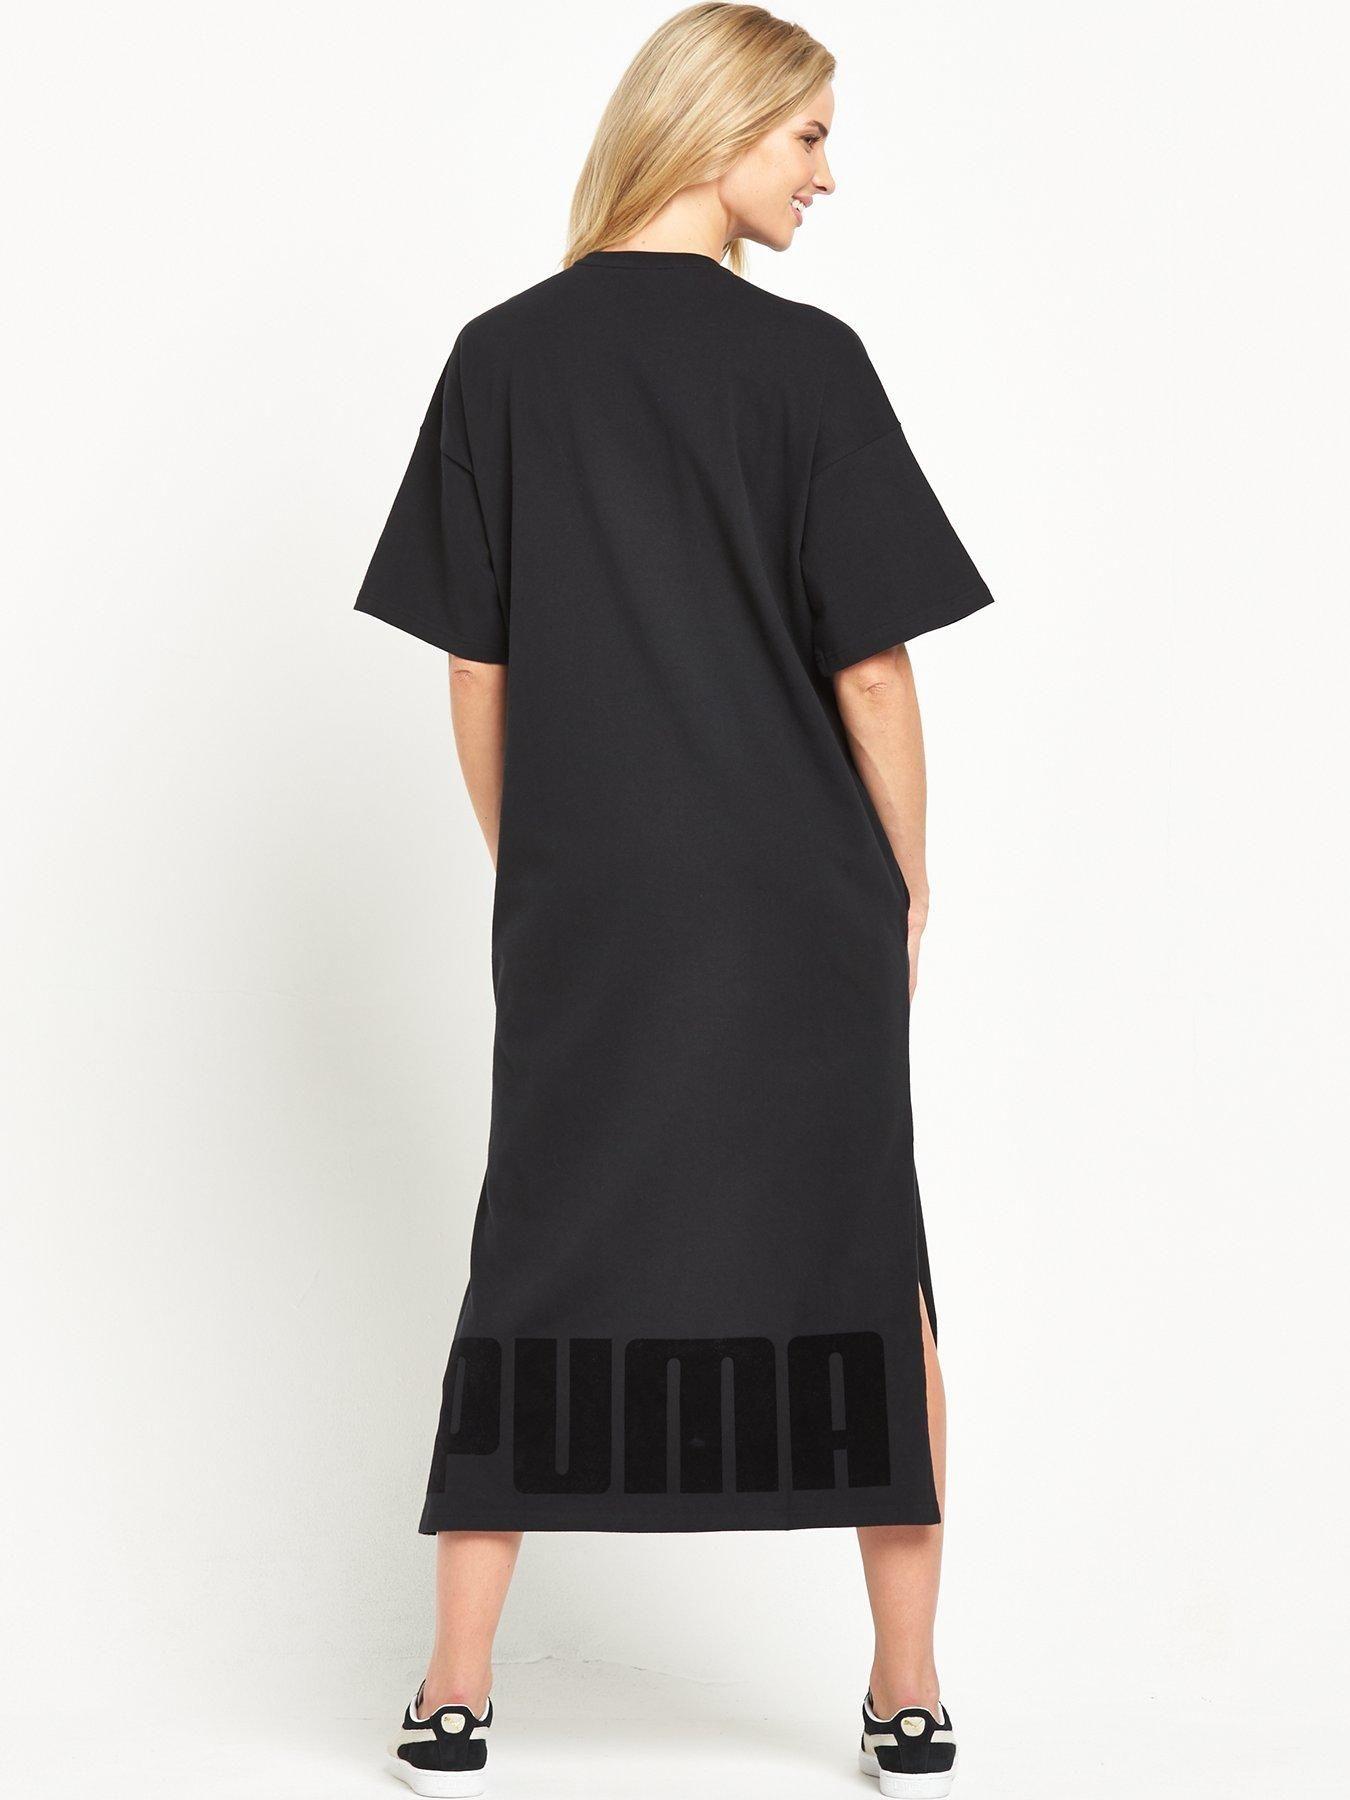 Puma Xtreme Dress